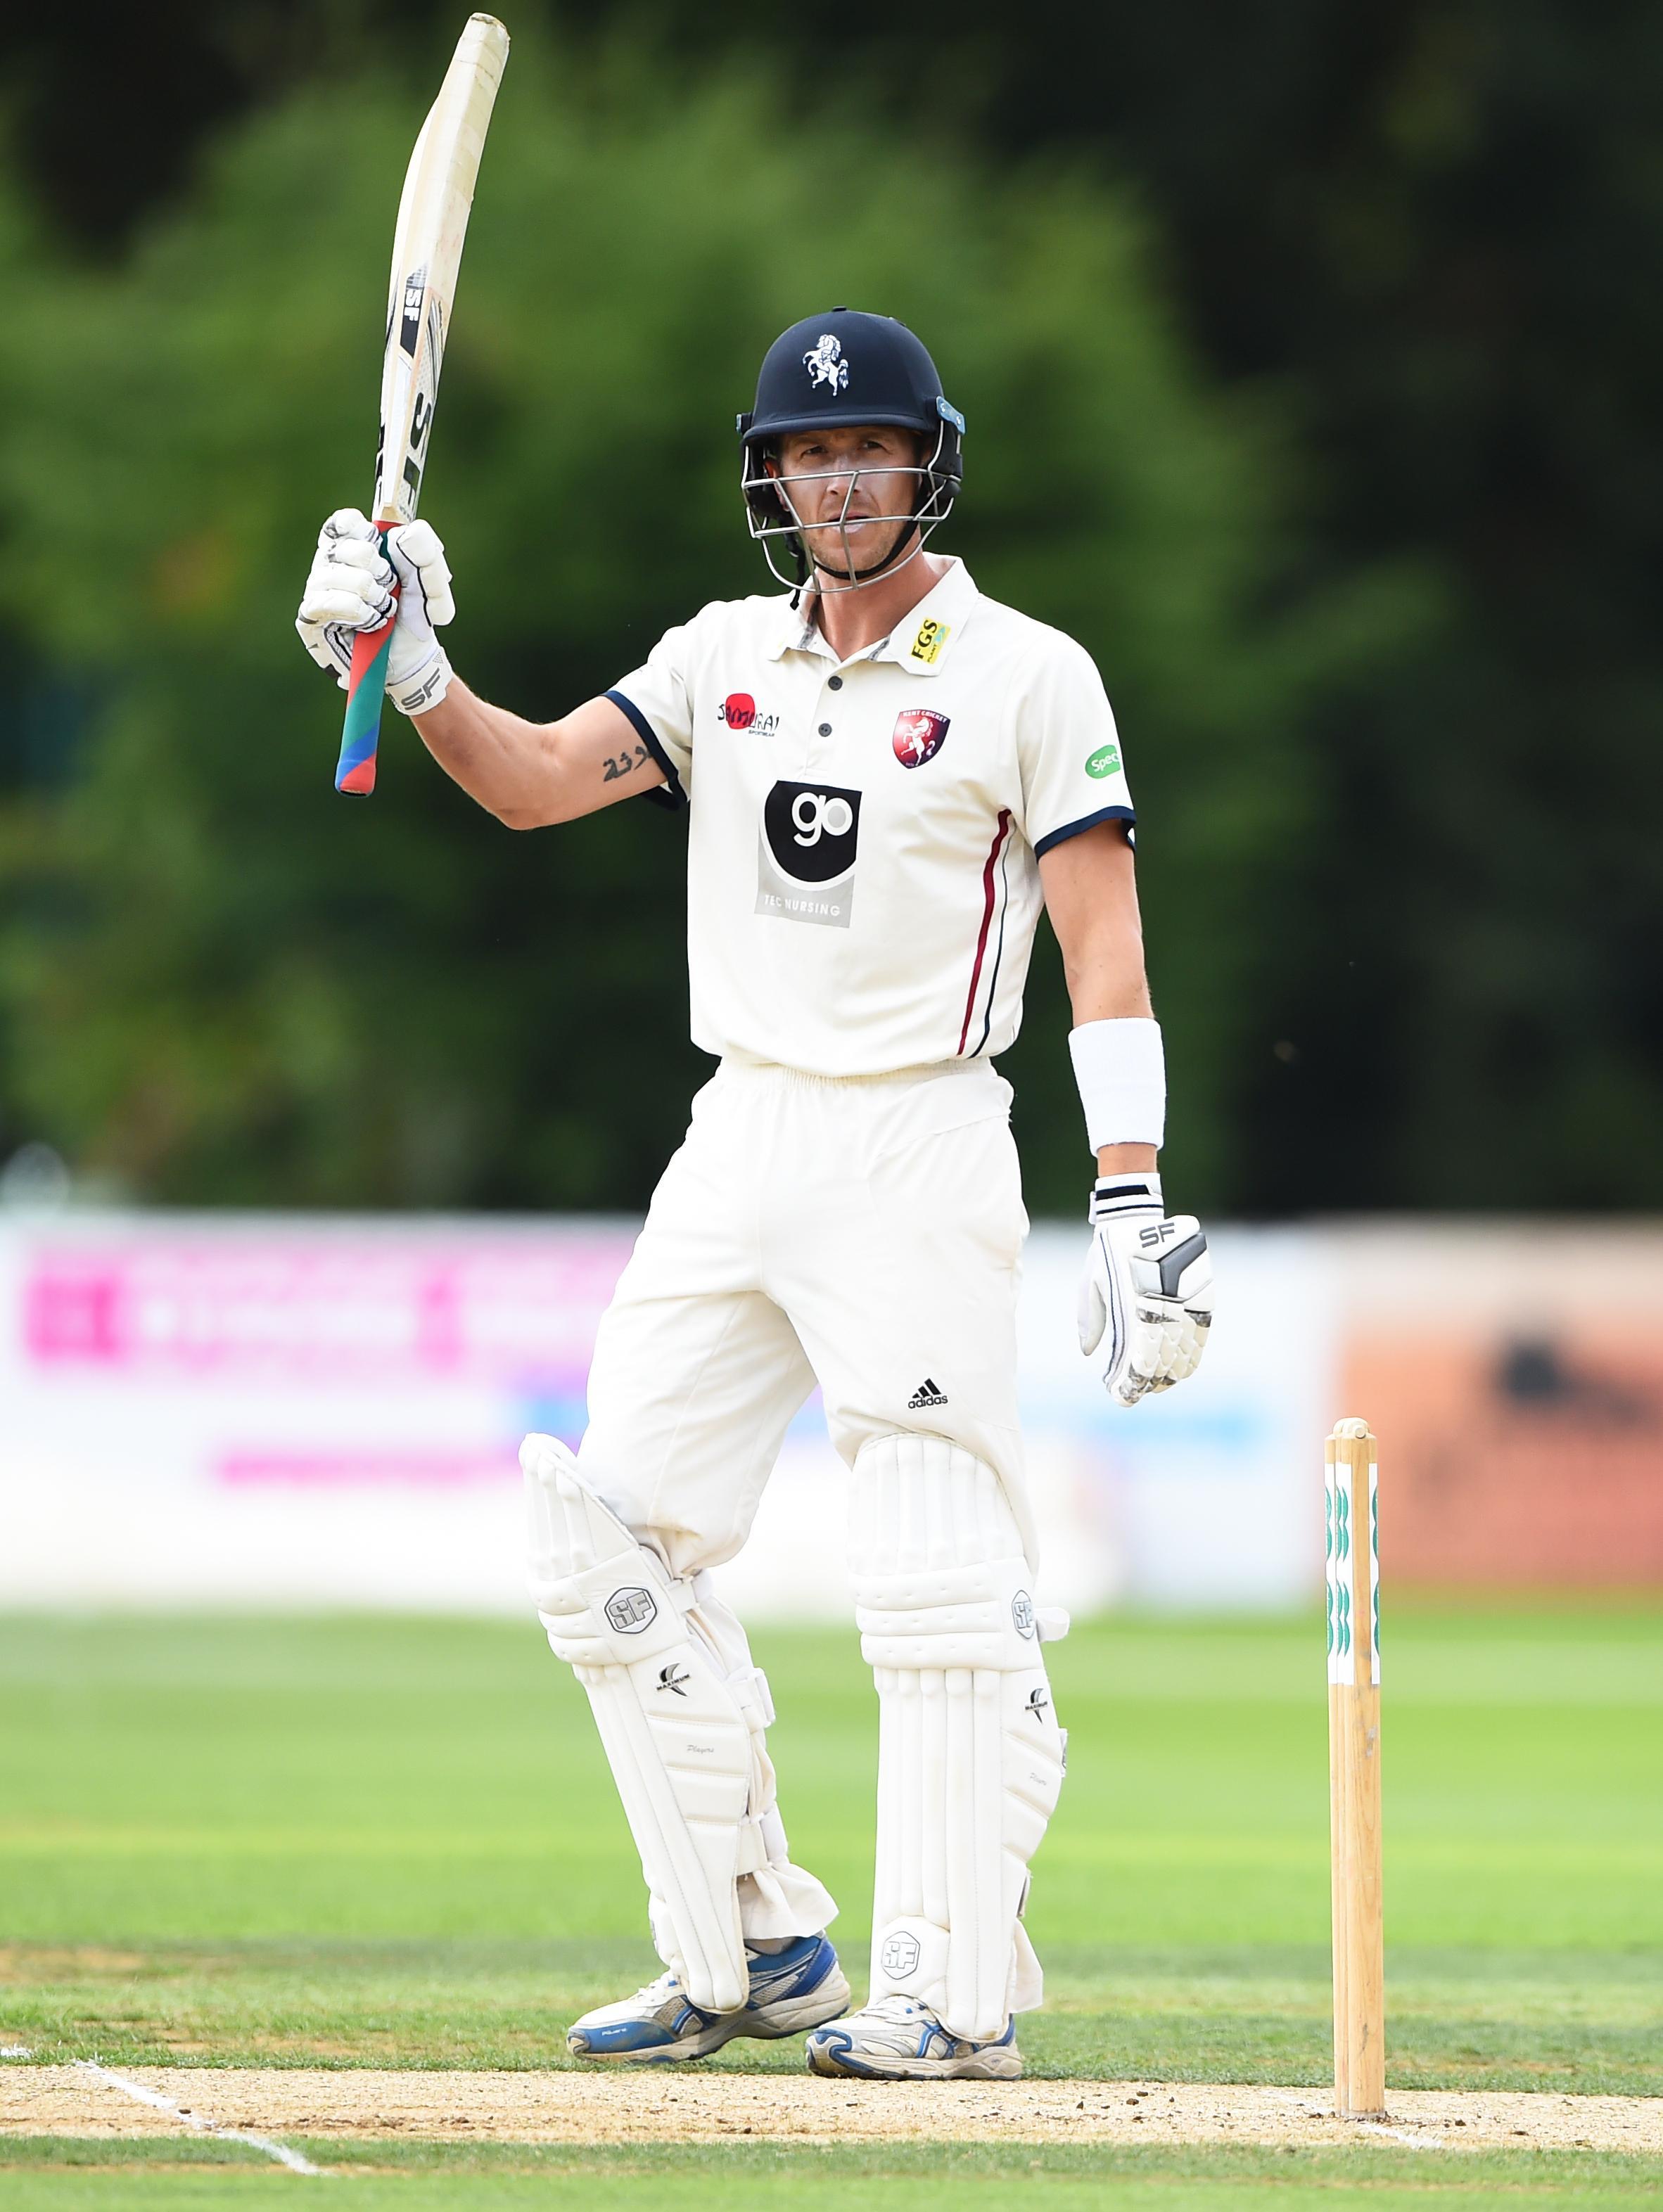 Joe Denly has been called up by England and could bat at No2 or No3